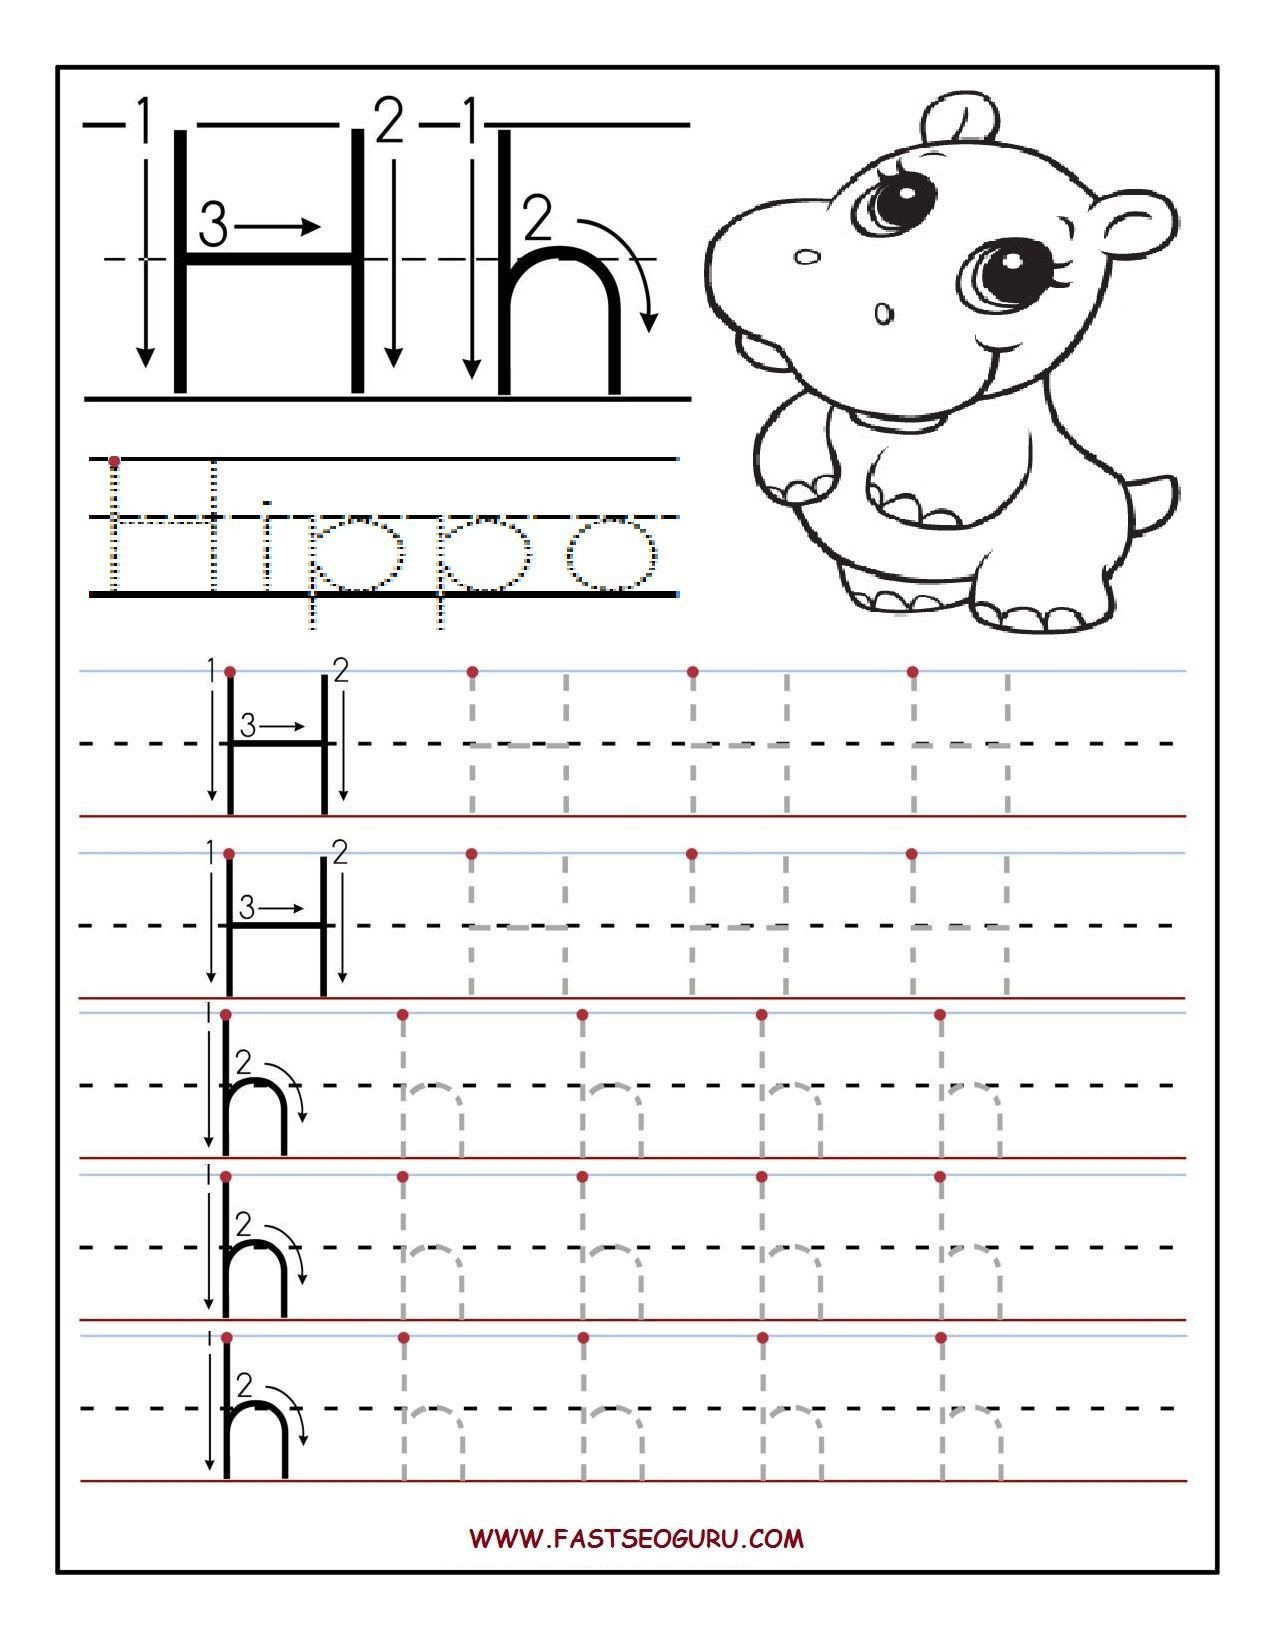 Letter H Worksheet For Kindergarten Worksheet For Kindergarten Tracing Worksheets Preschool Alphabet Worksheets Preschool Letter H Worksheets